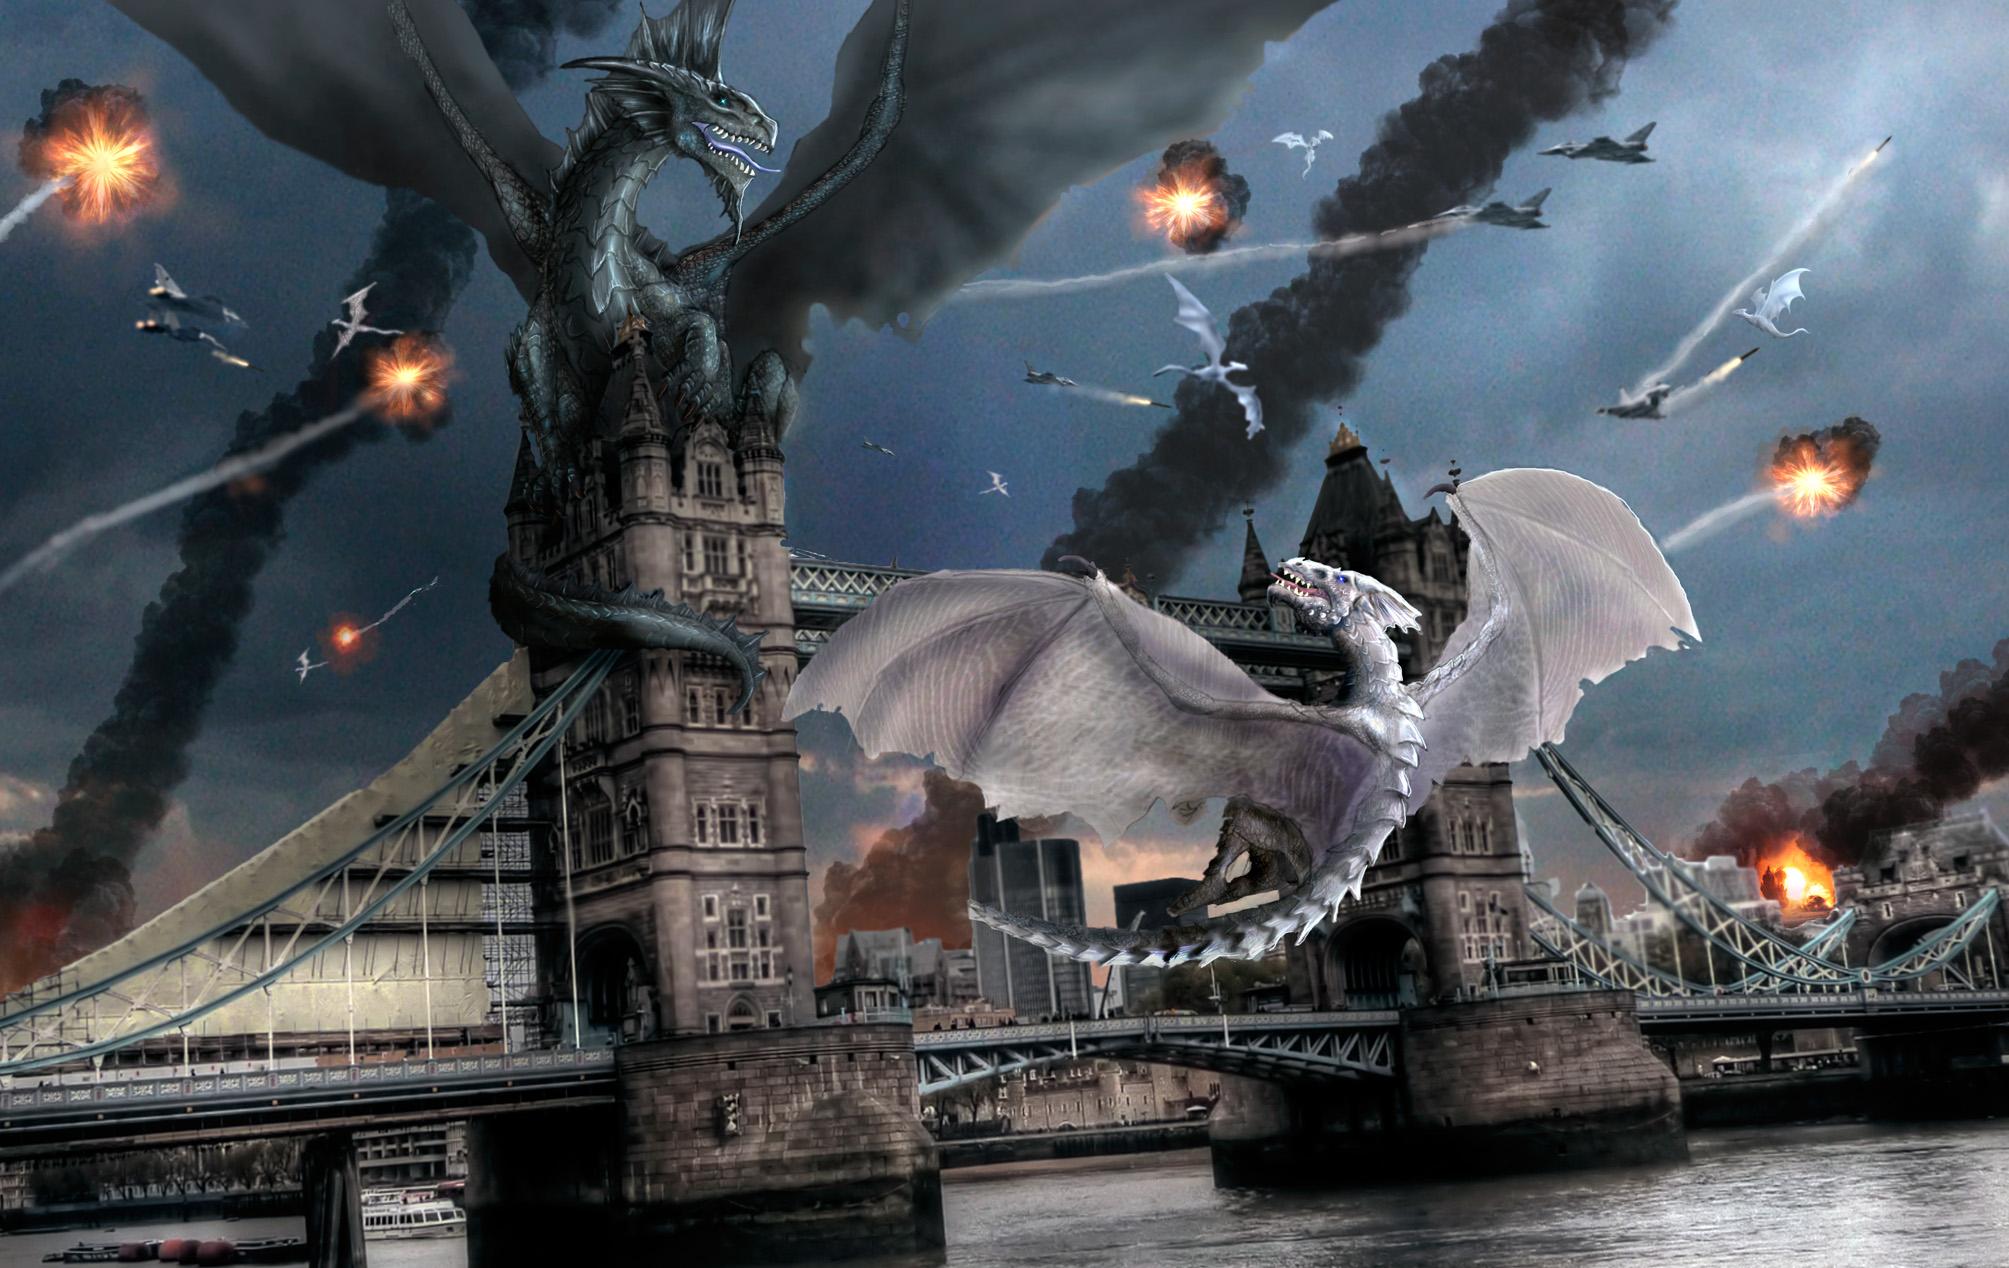 Silver Throne by Netarliargus